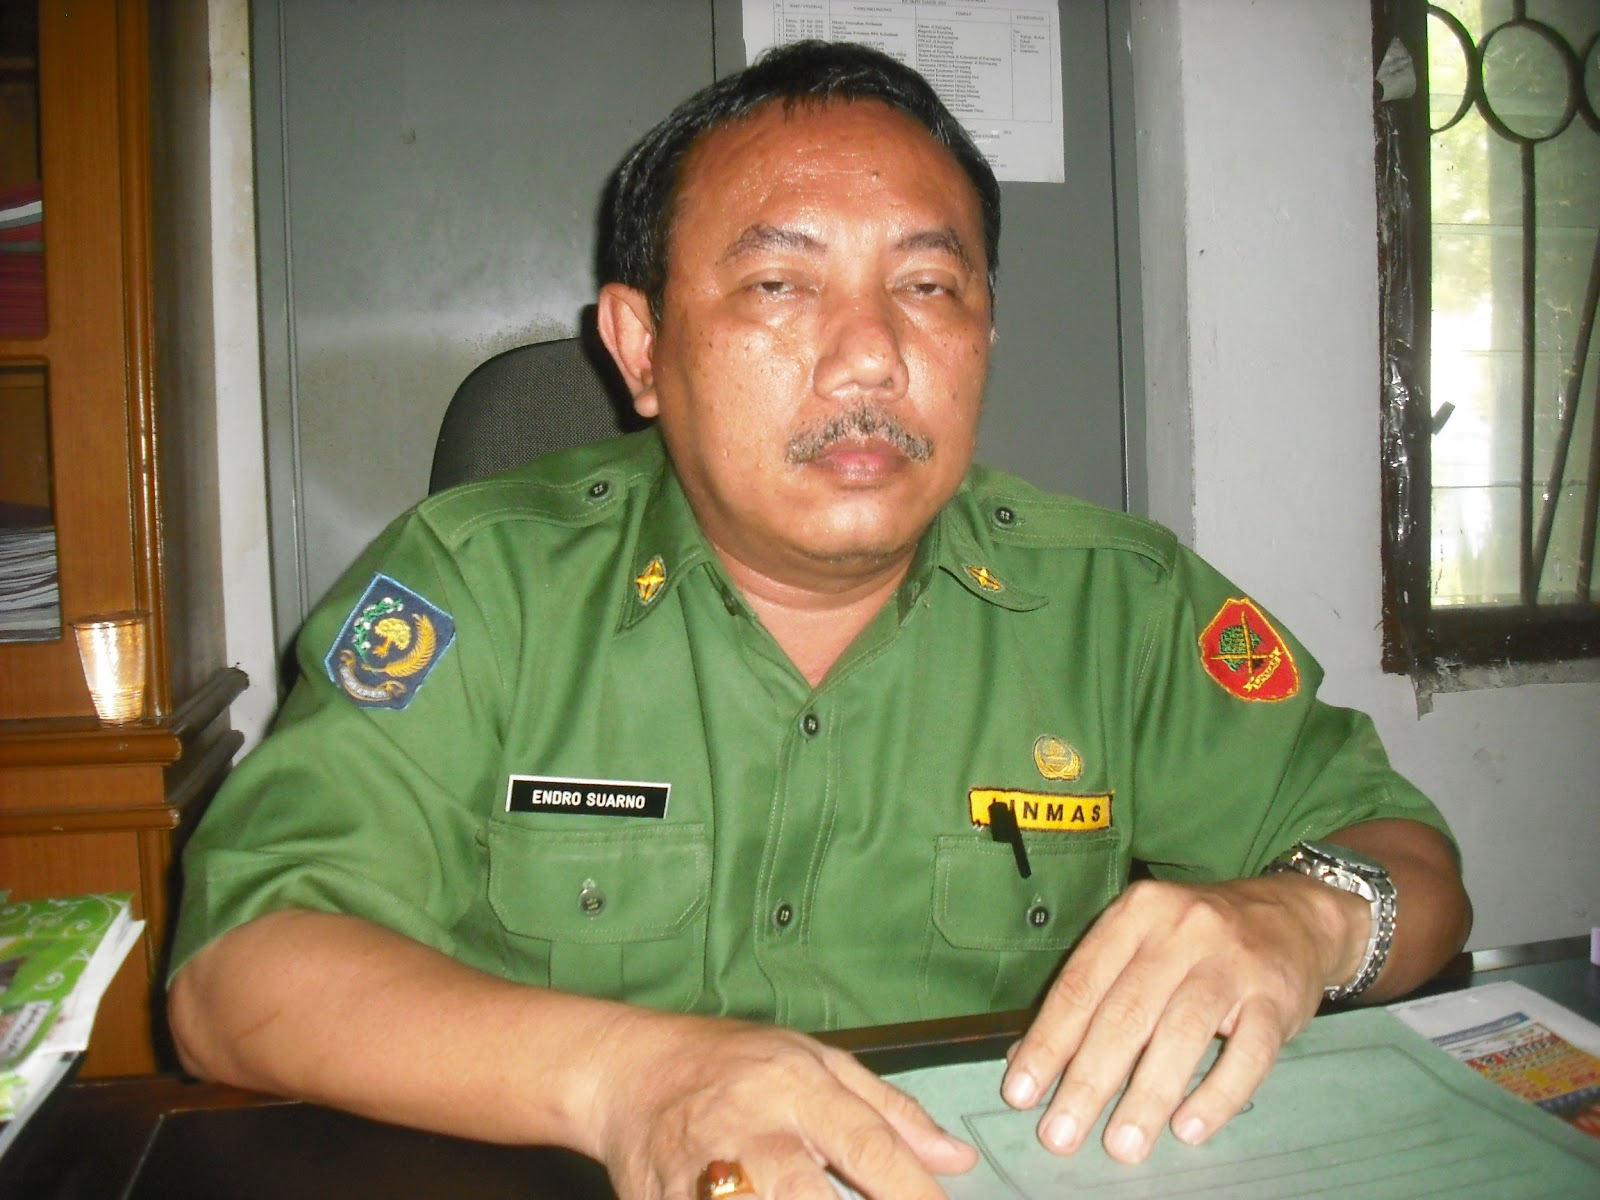 Endro Suarno Inspektur Inspektorat OKI Yang Baru